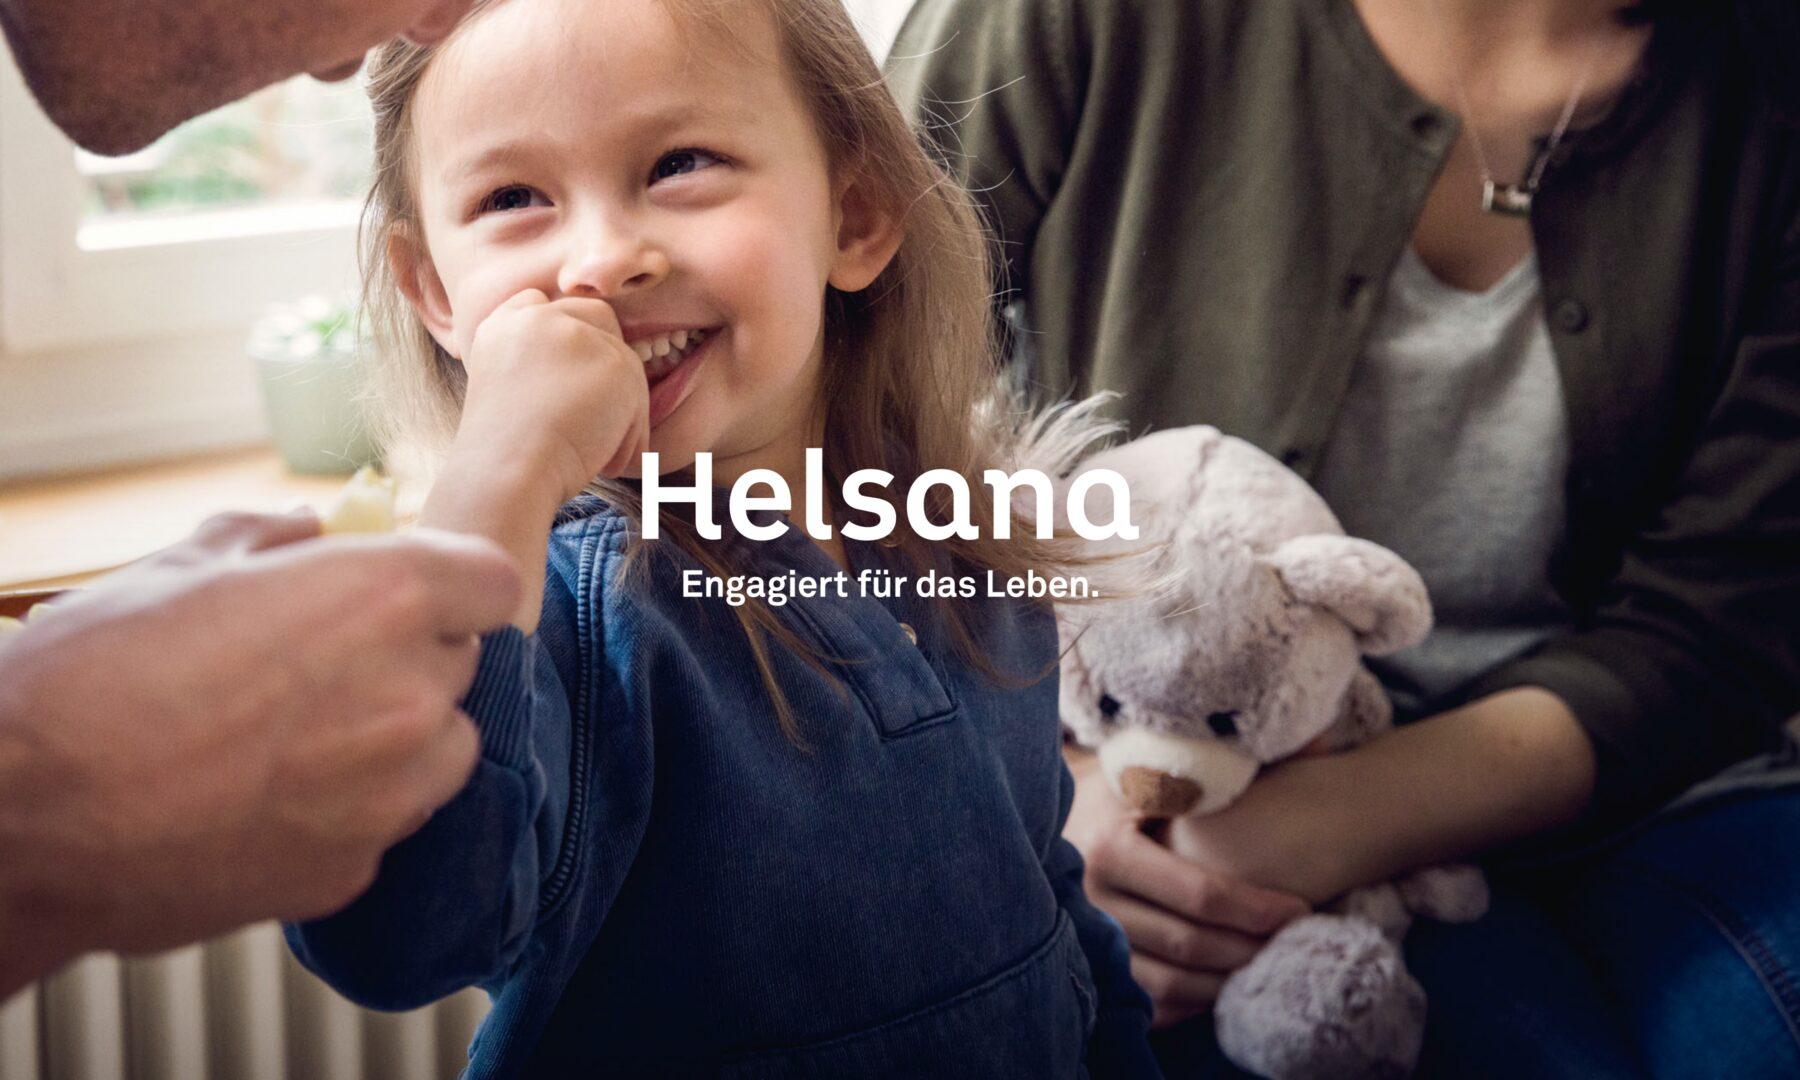 Helsana Rebranding Logo und Bildwelt